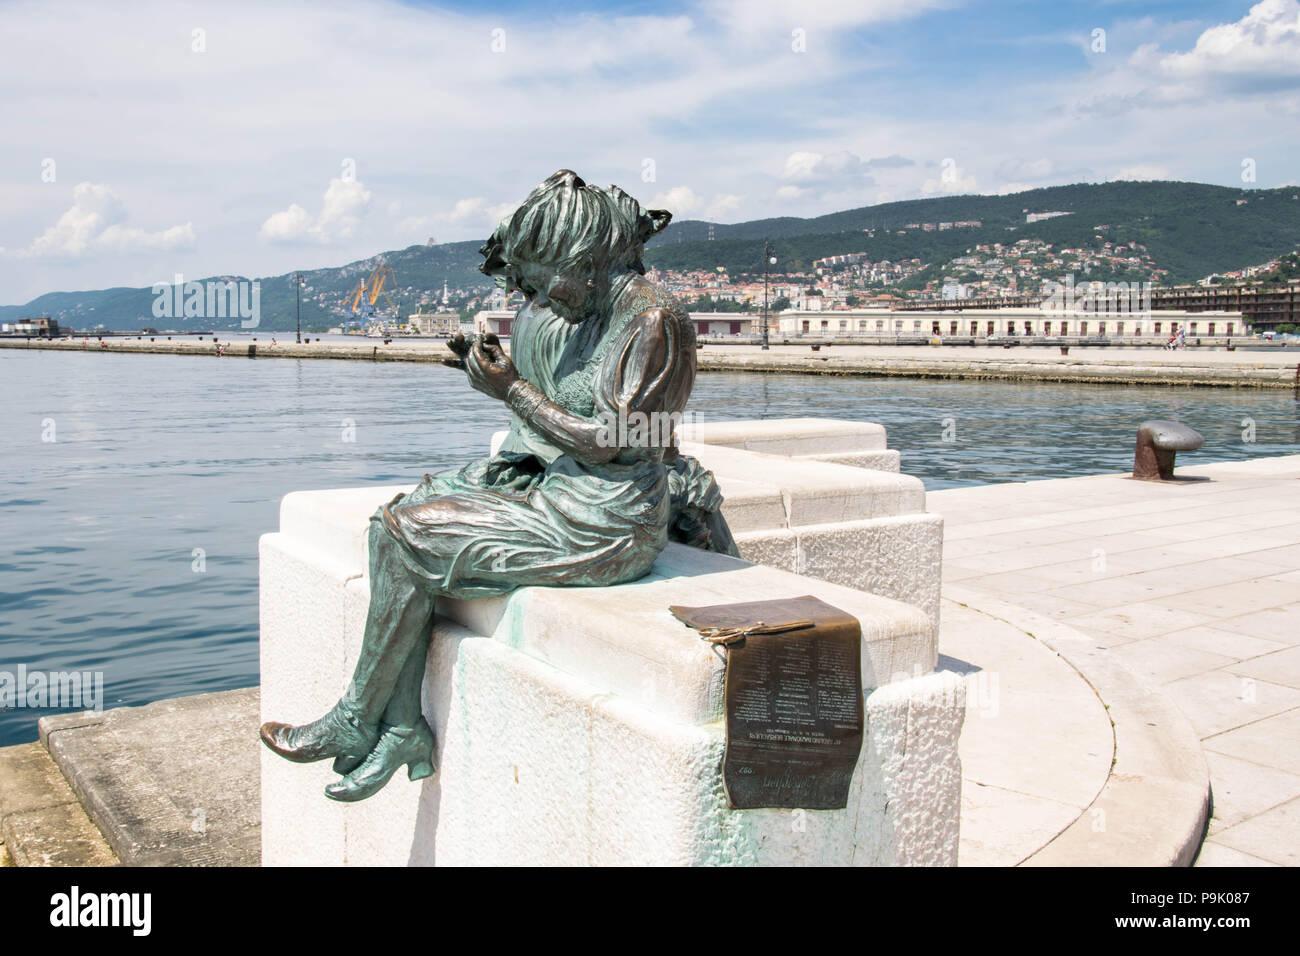 Europa, Italia, Trieste - una de las figuras de Scala Reale monumento en Trieste, cerca del Molo Audace. Foto de stock